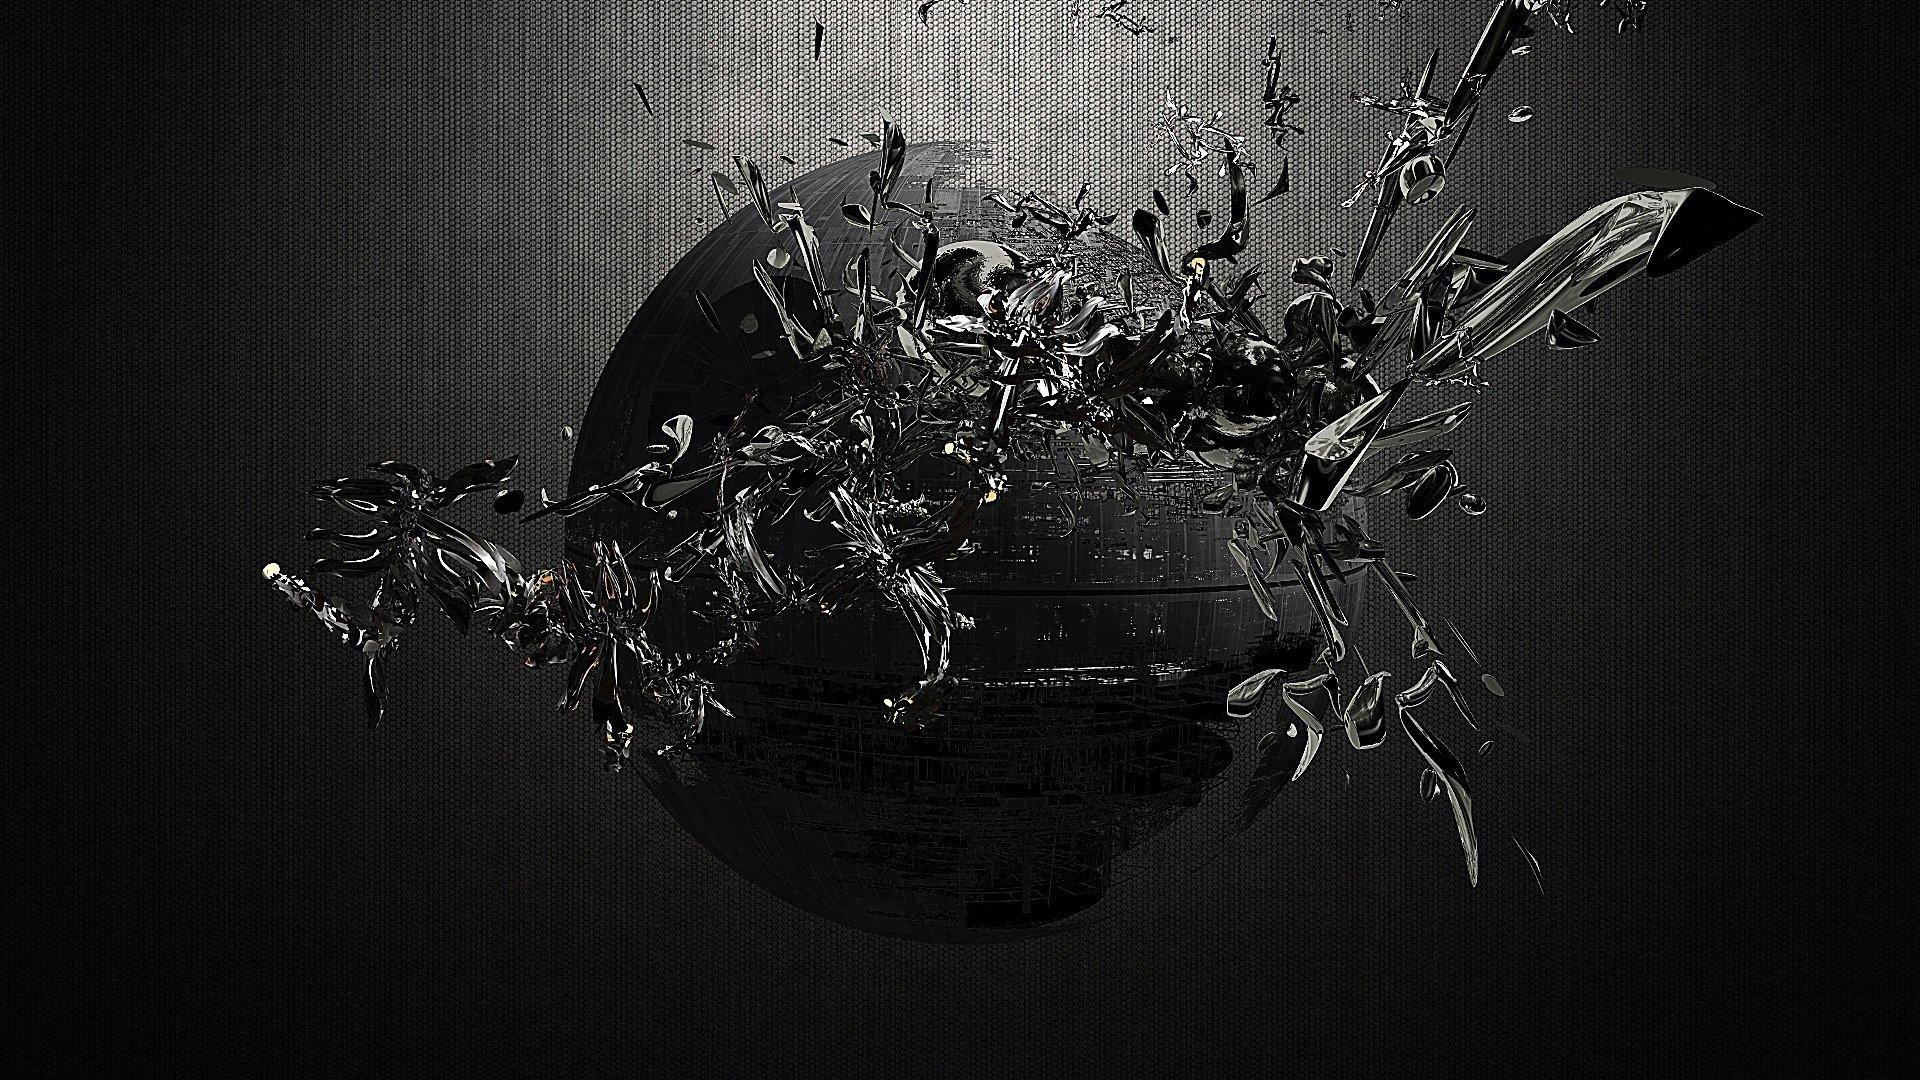 Star Wars Death Star wallpaper 1920x1080 264560 WallpaperUP 1920x1080